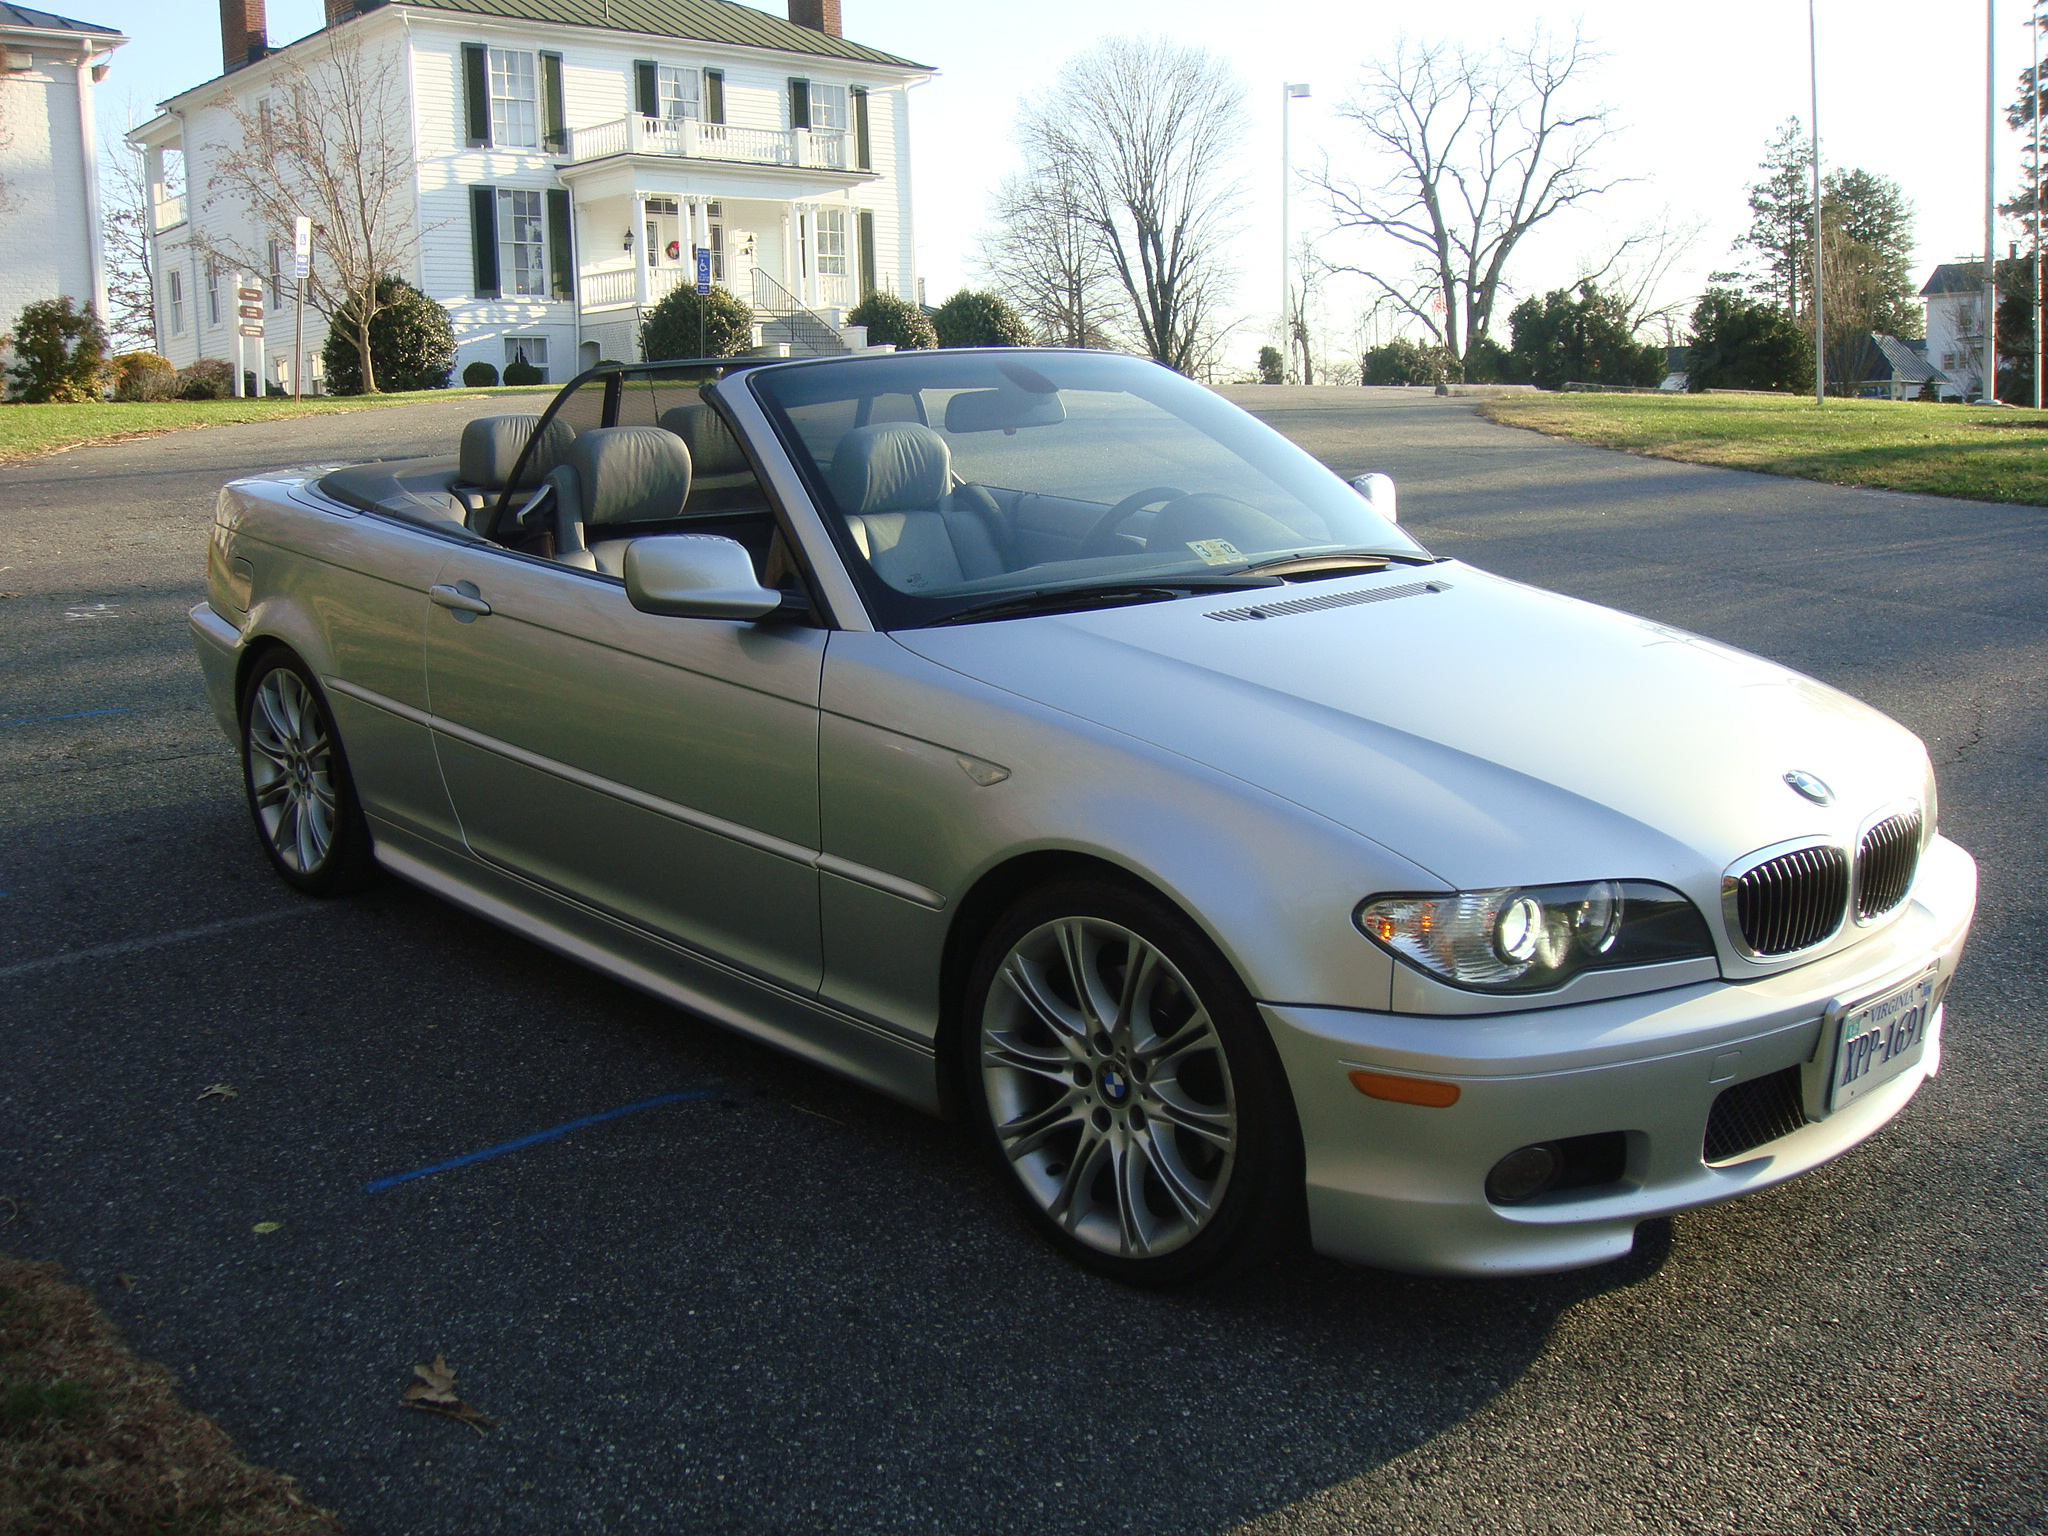 For Sale 2004 Bmw Zhp 330ci Titanium Silver Grey